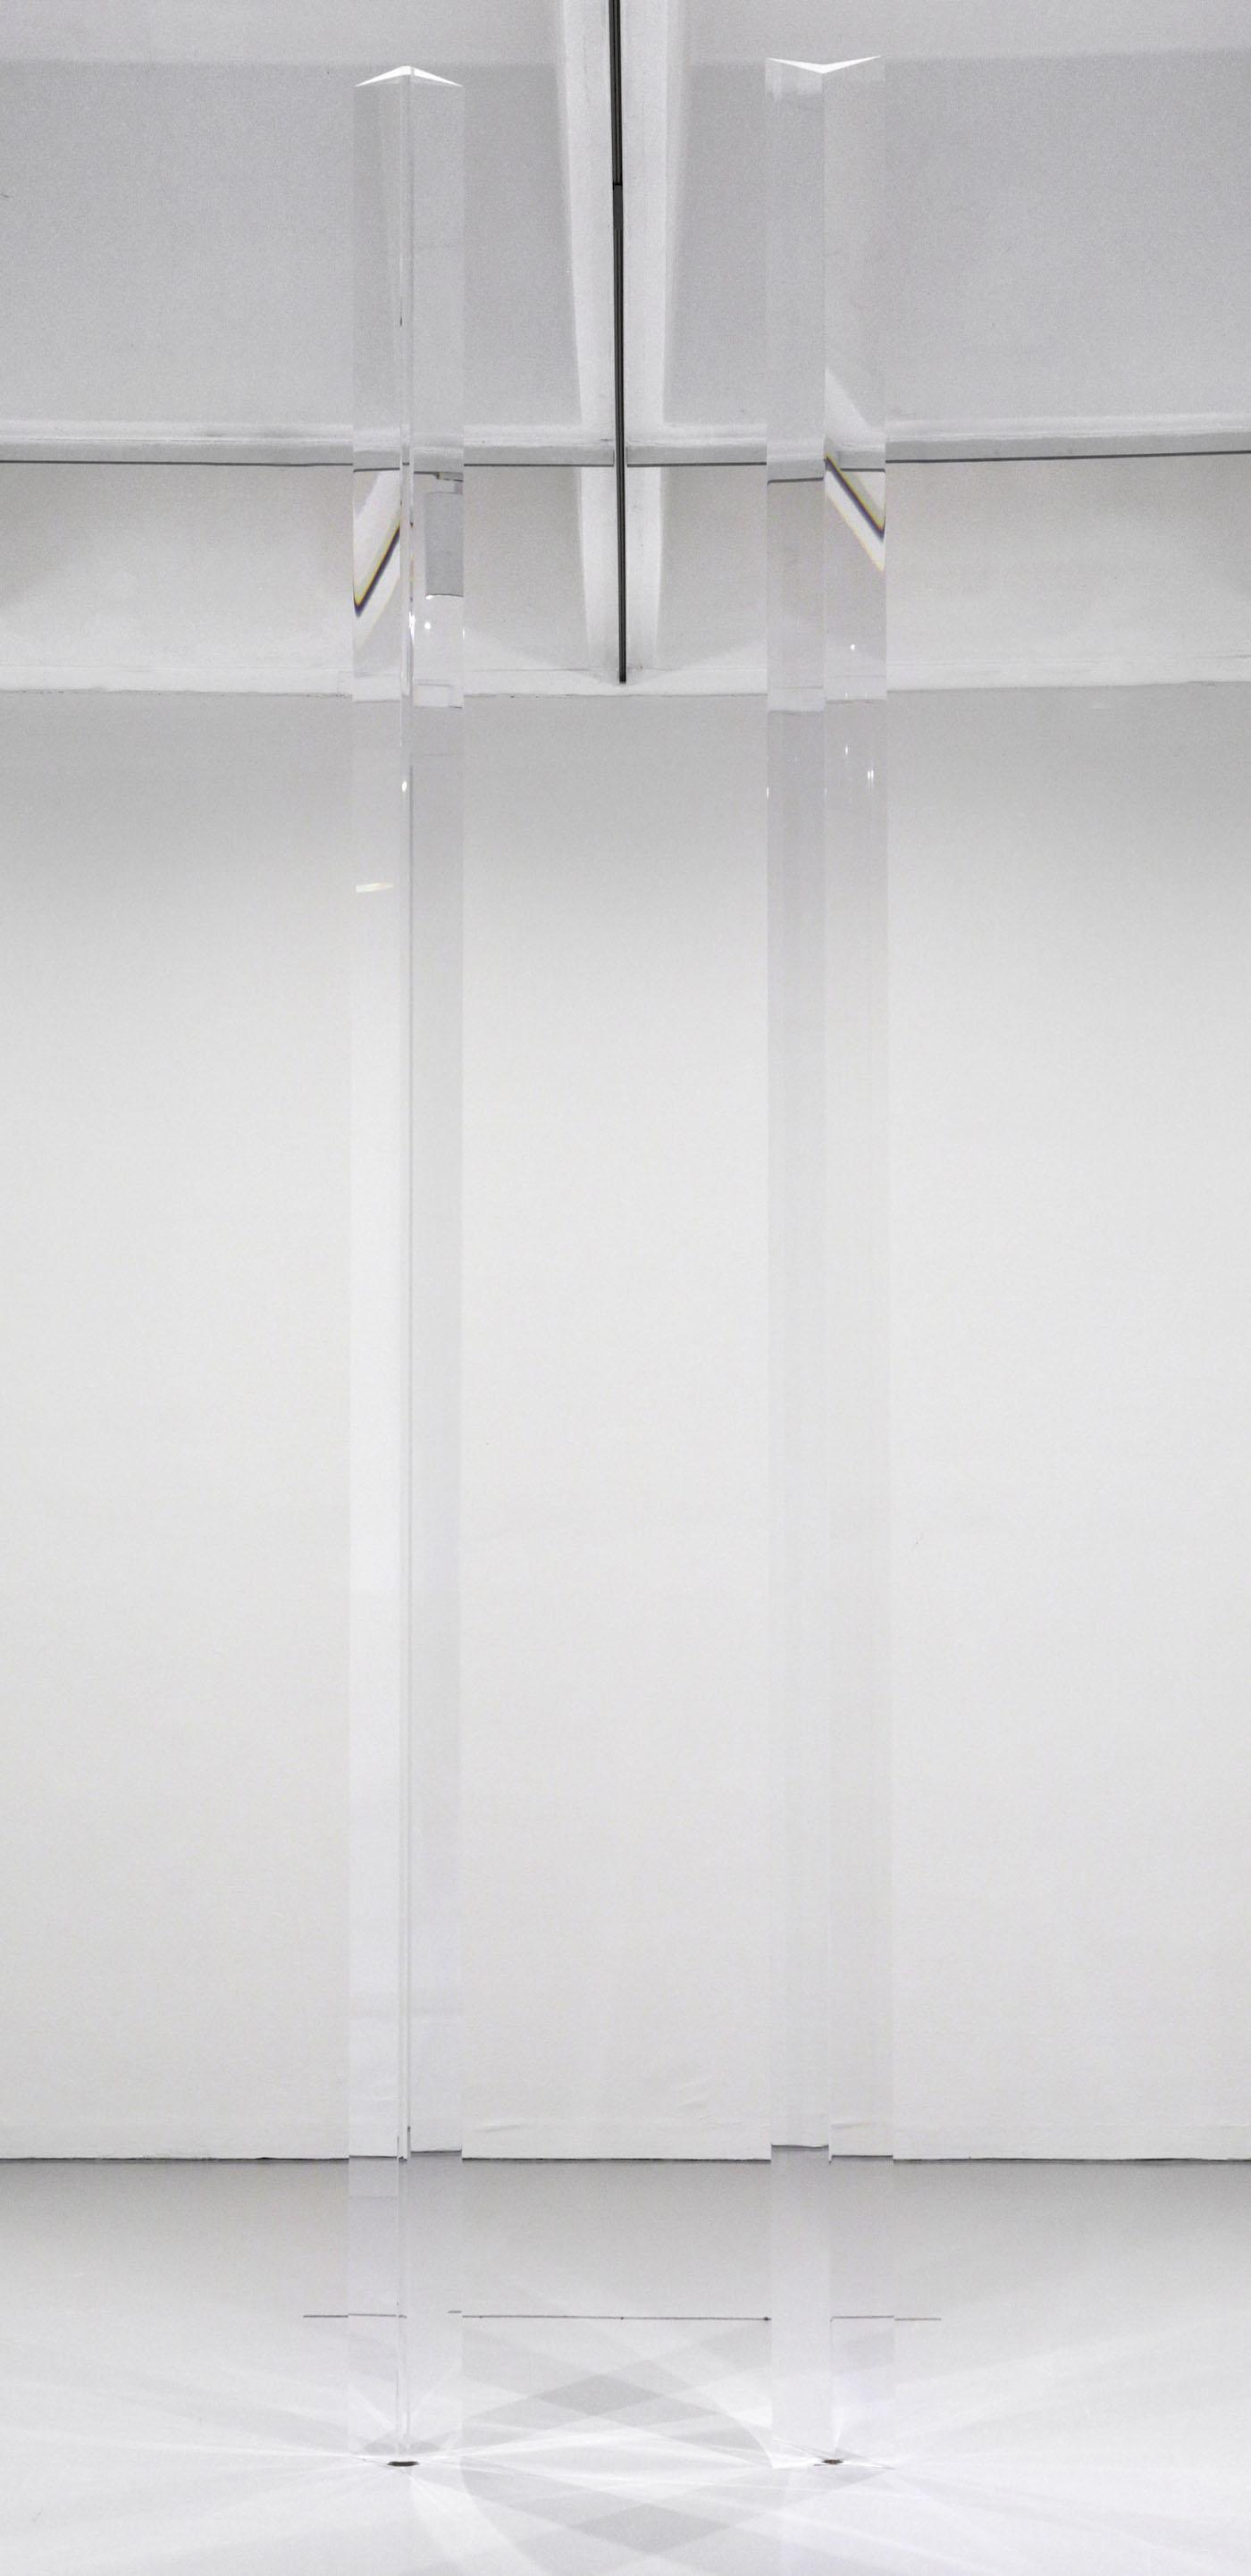 Robert Irwin installation columns 4cc